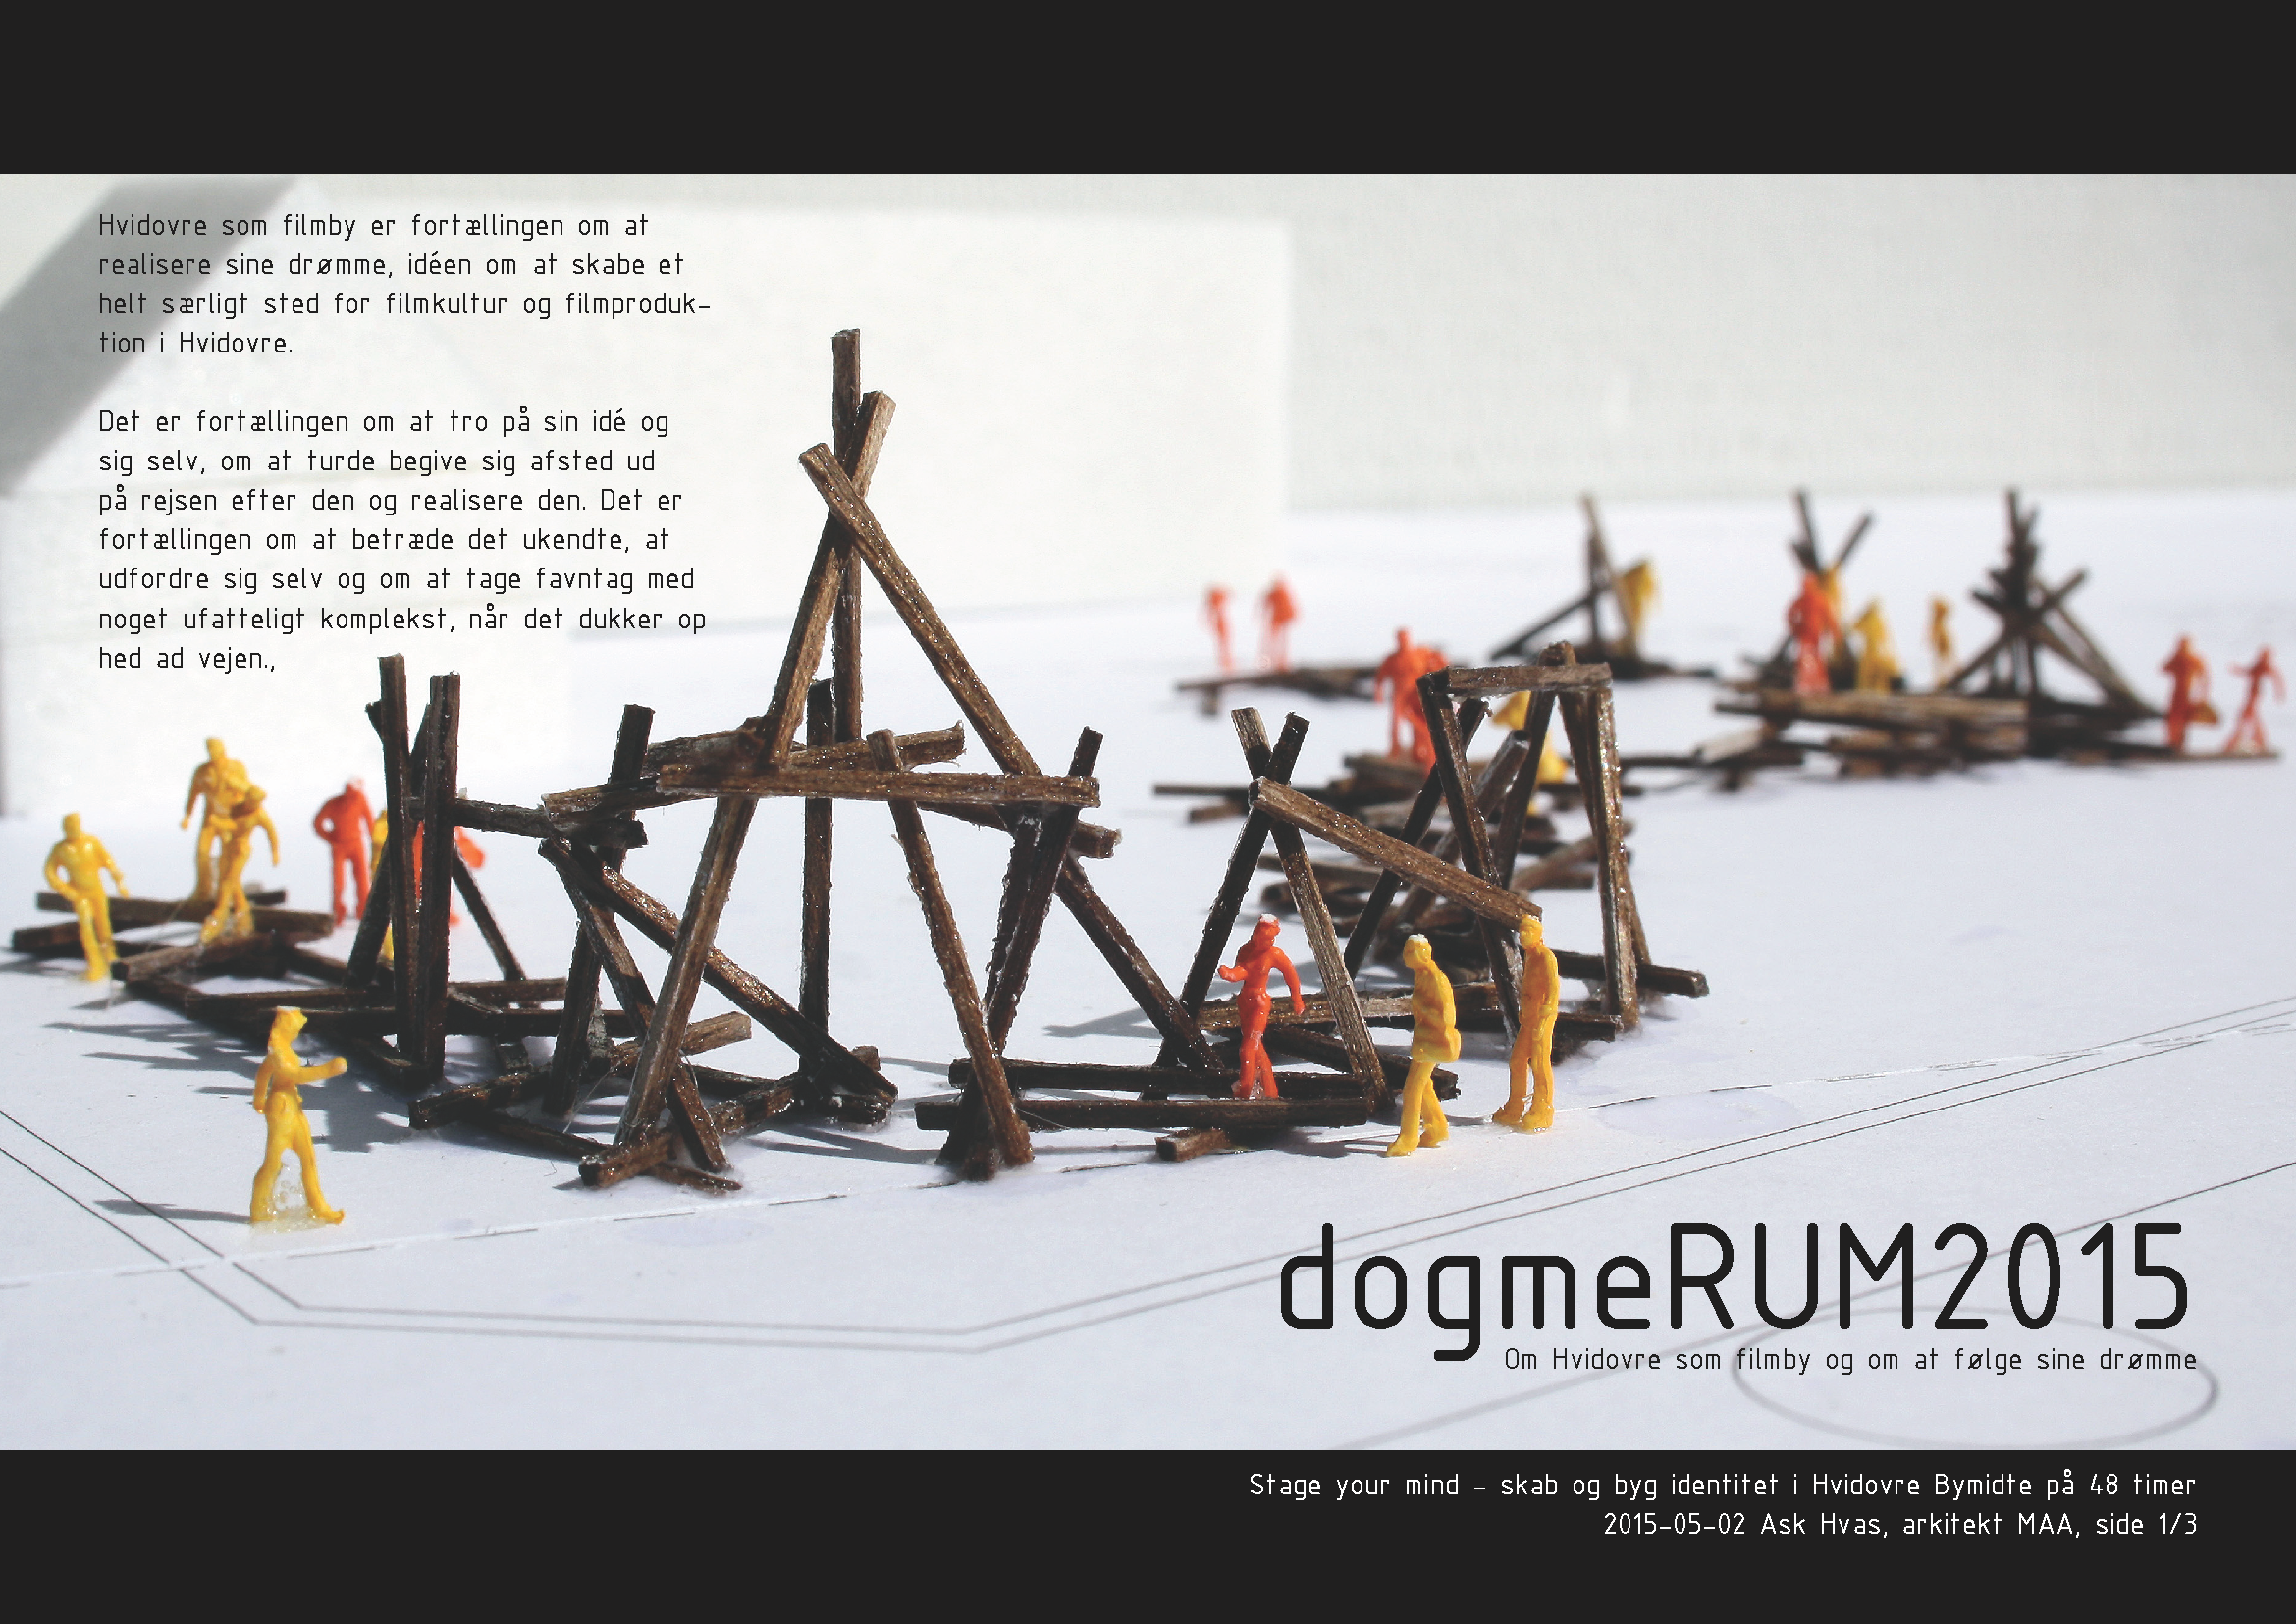 dogmeRUM2015_Page_1